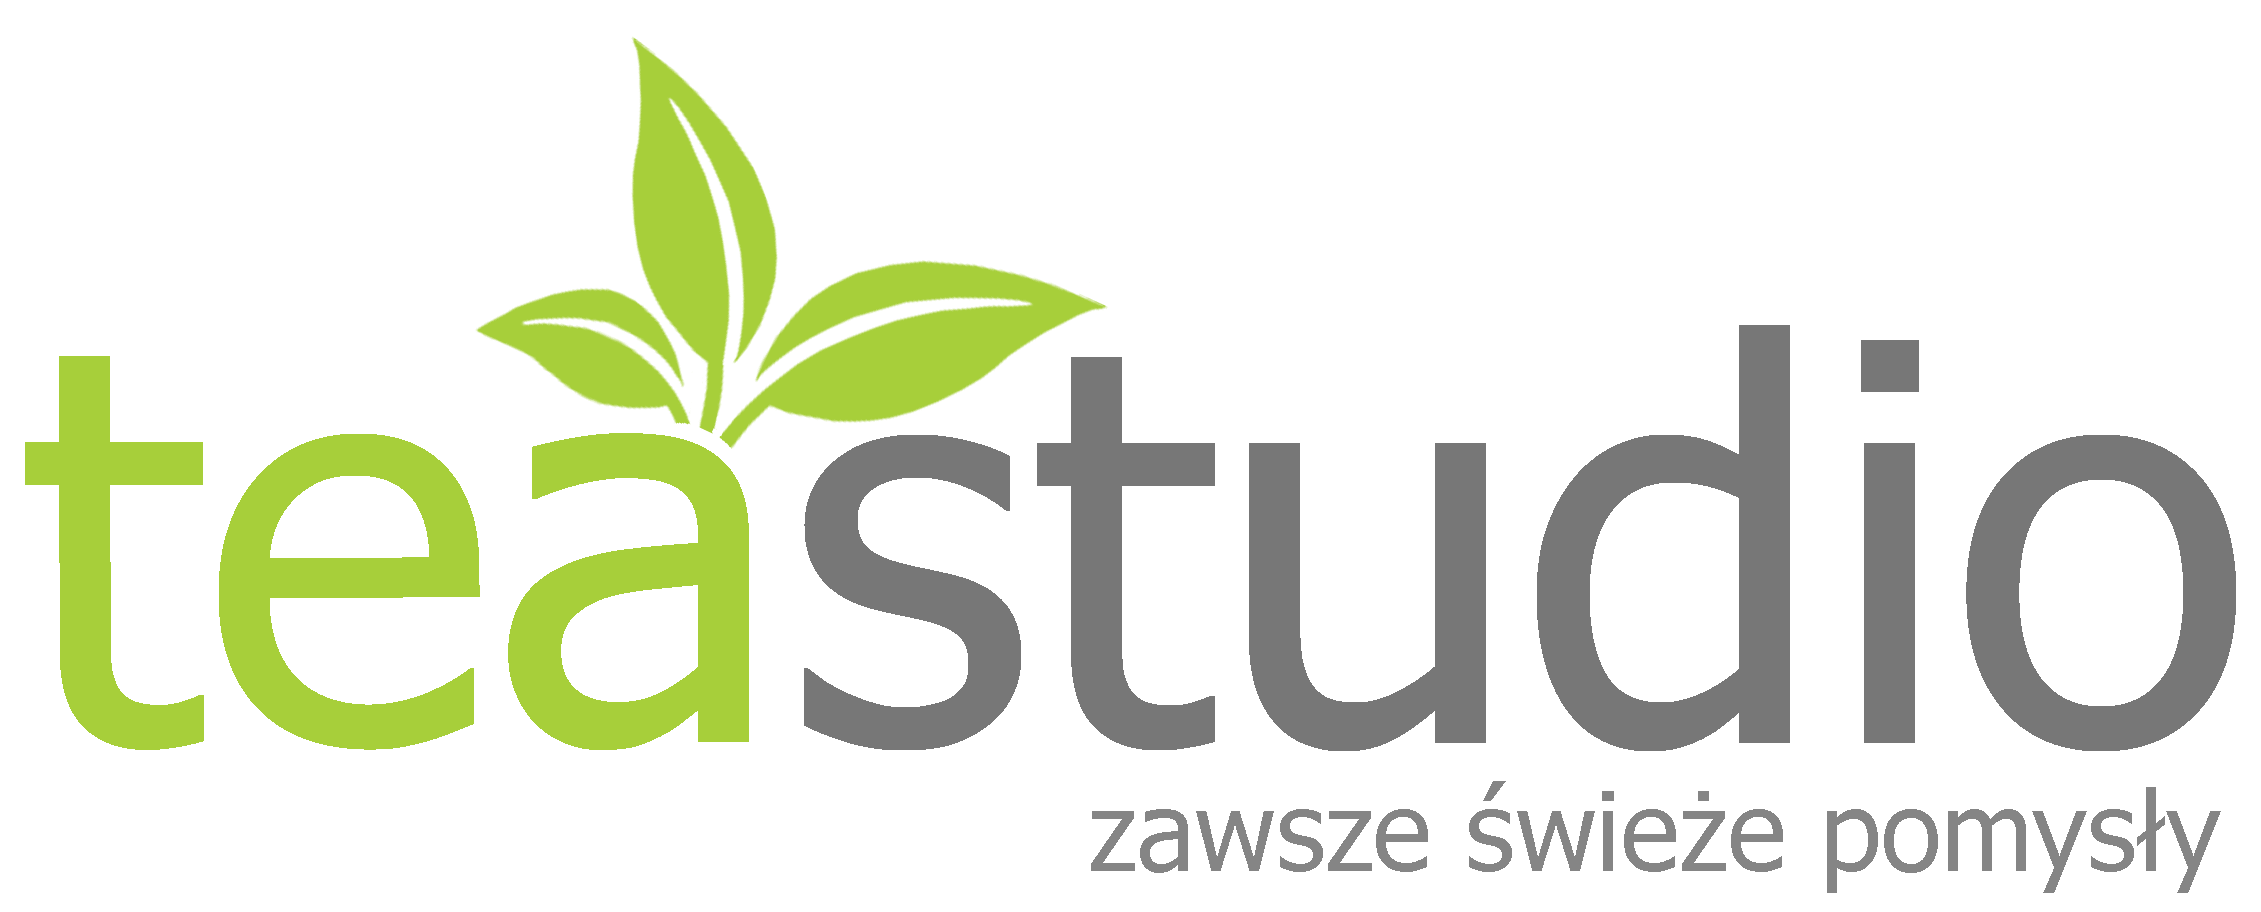 teastudio logo